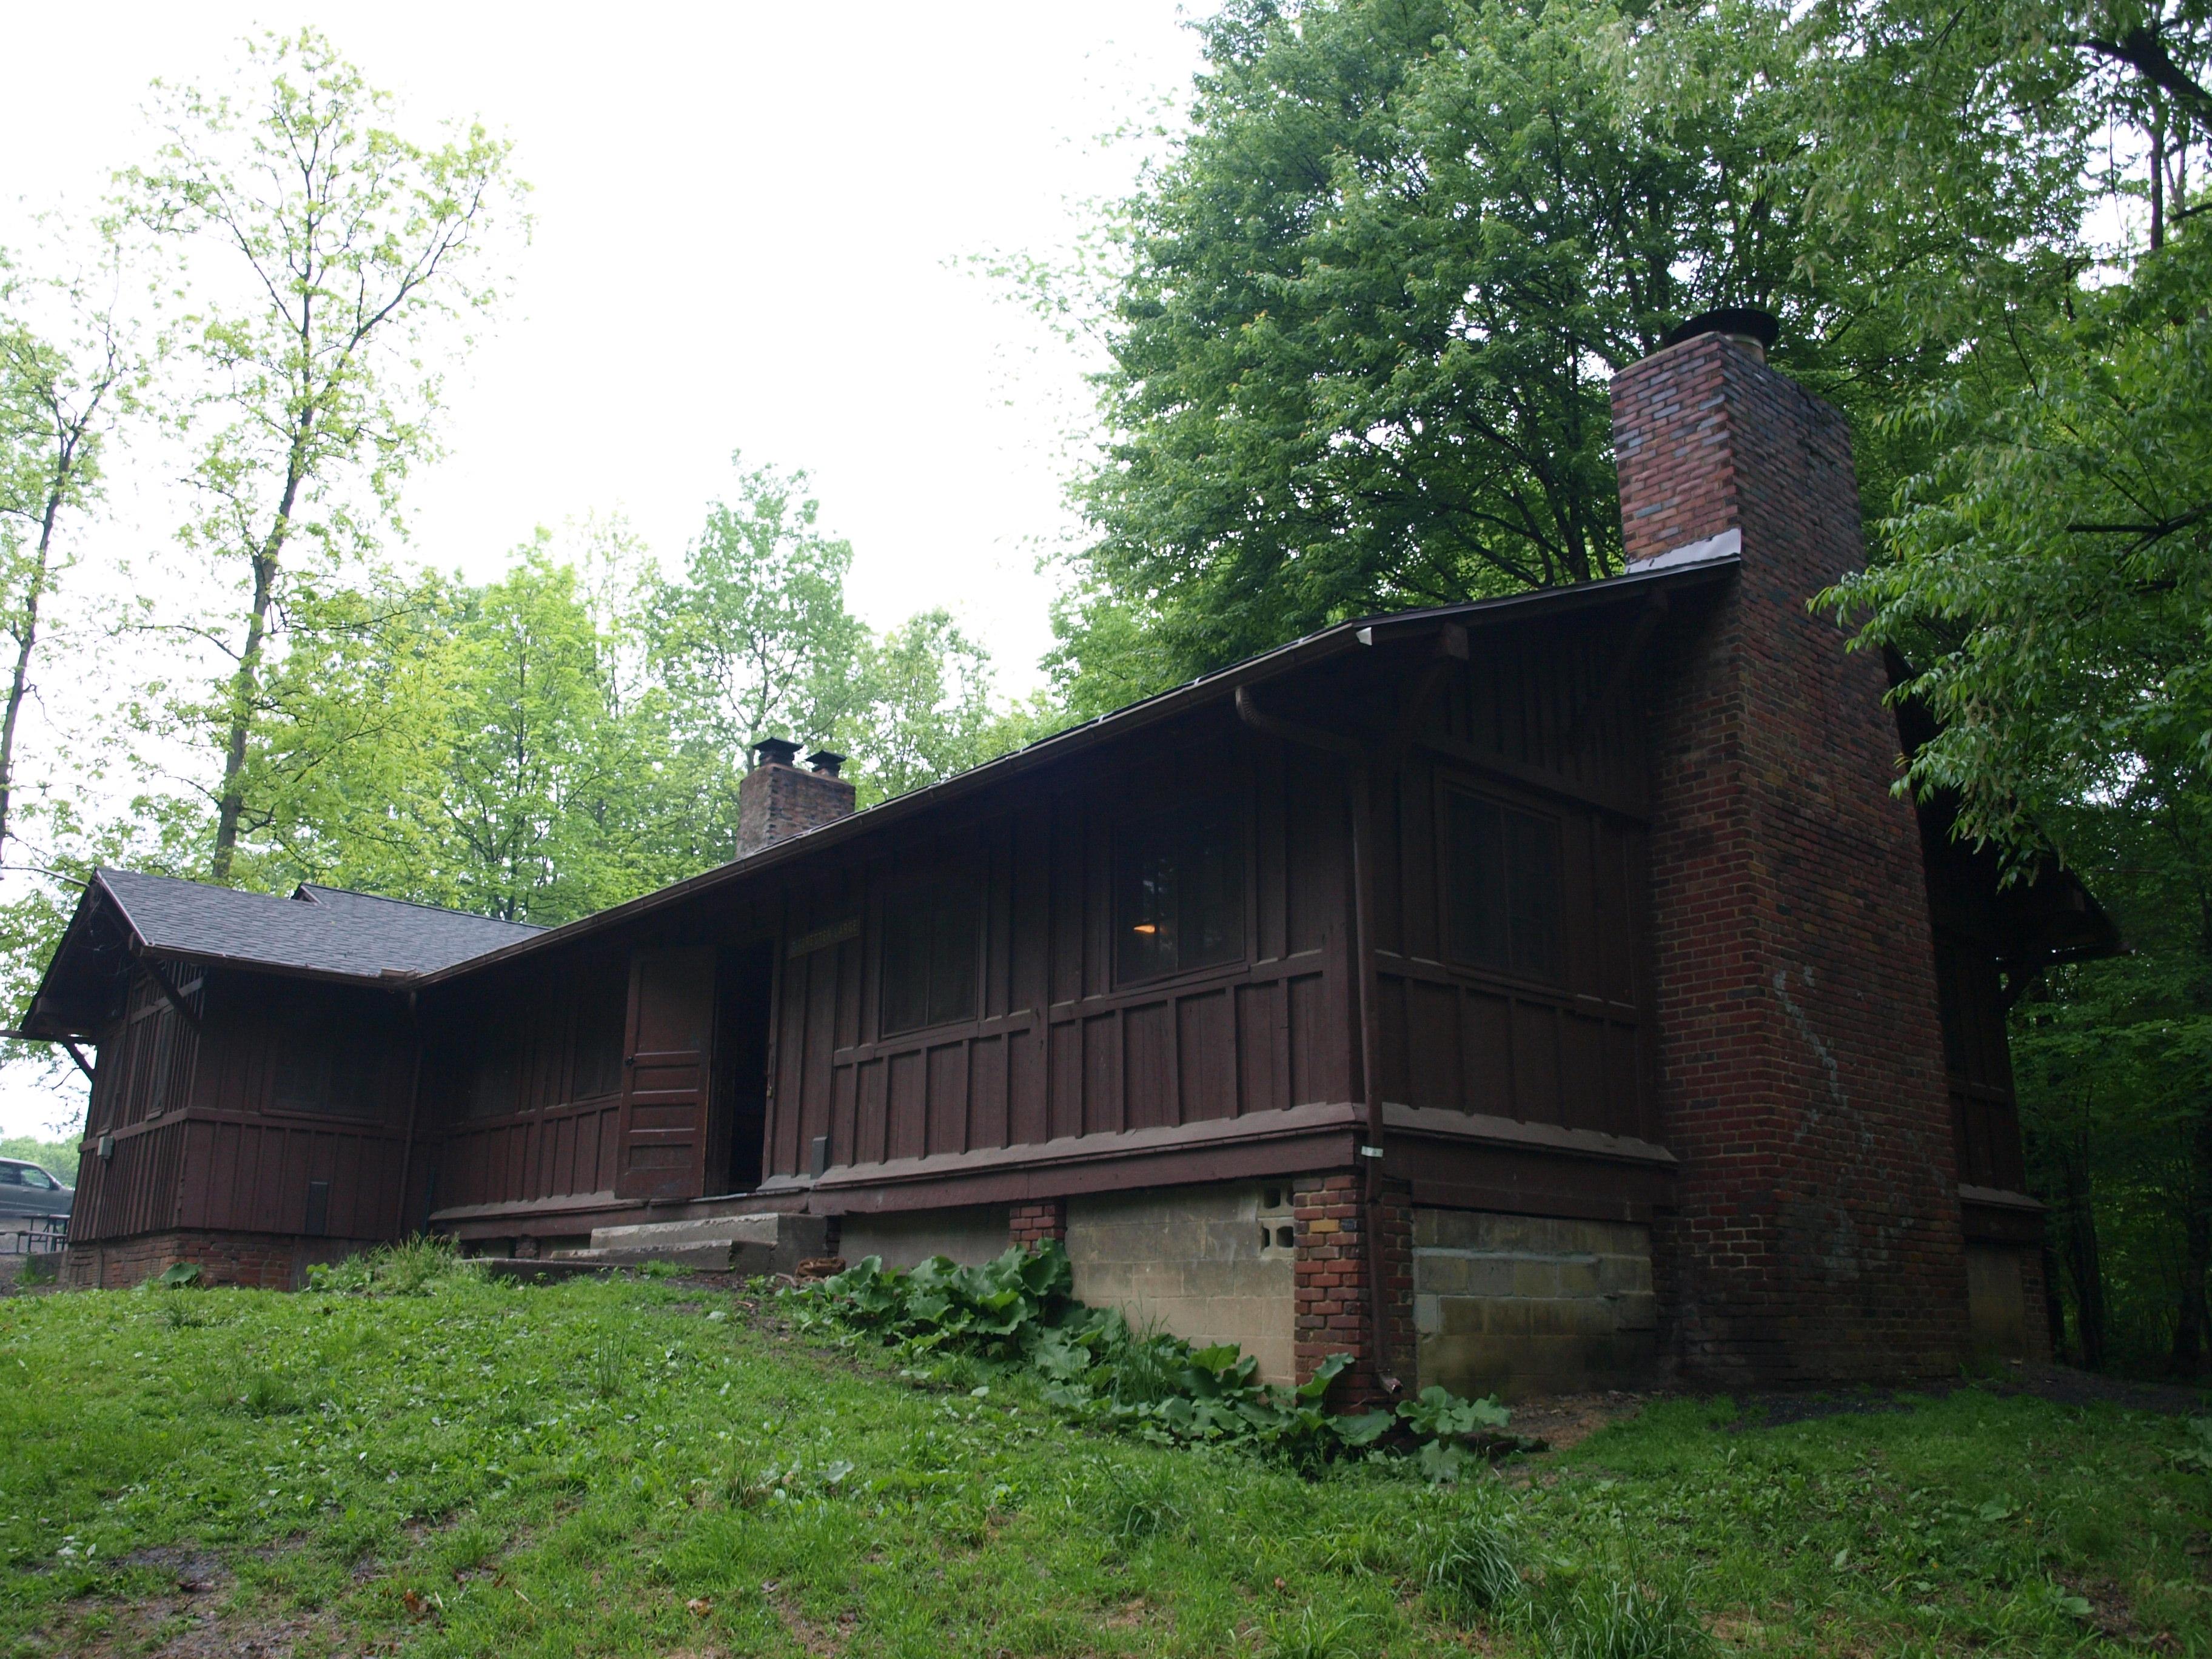 in sandusky lodging ohio cabins bayshore type site campgrounds koa